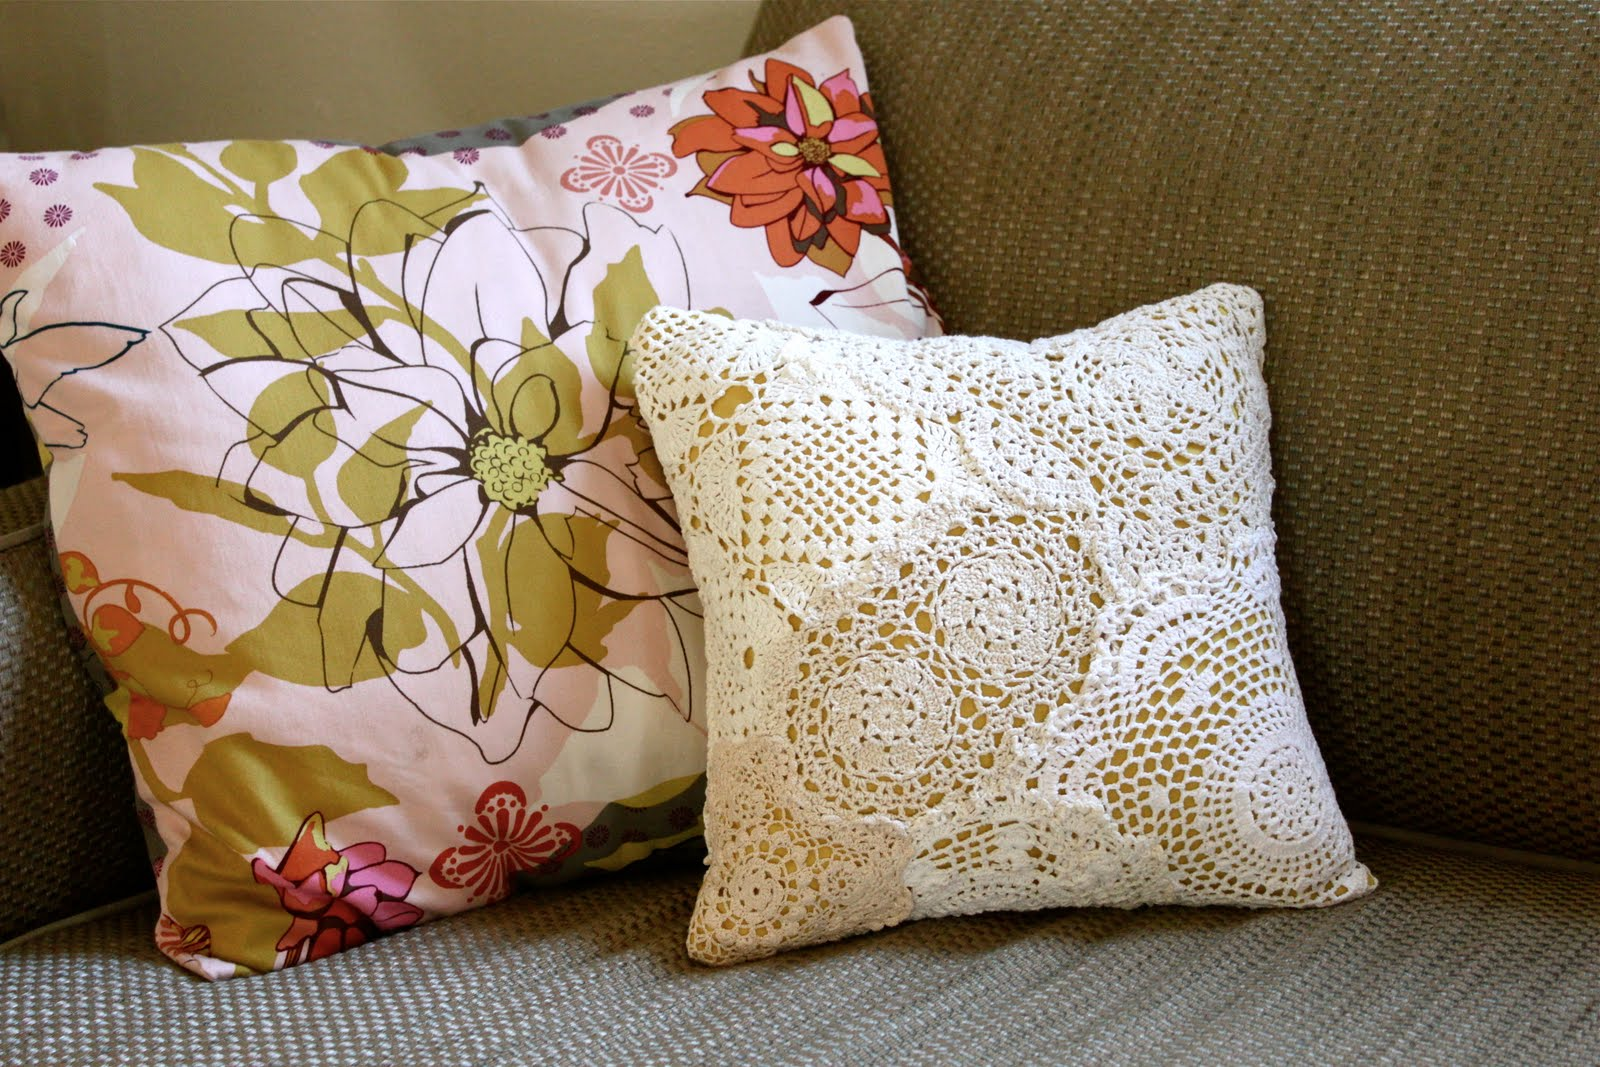 Красивые подушки своими руками фото 35